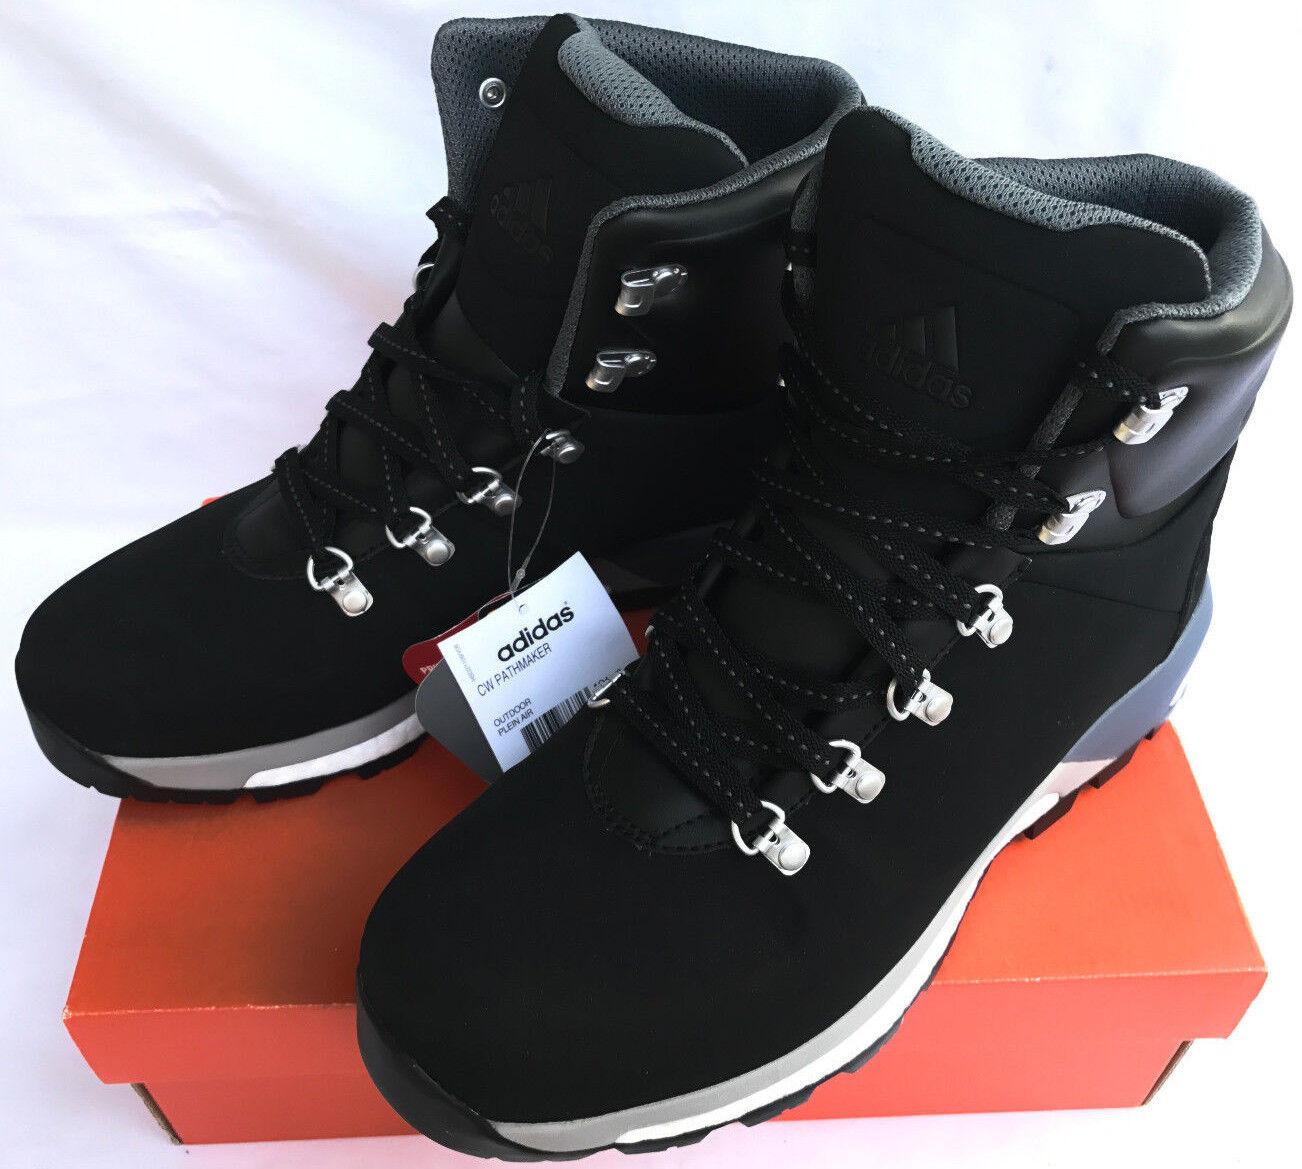 Adidas CW Pathmaker AQ4052 Boost Black Sneakerboots Hike Hiking Boots Men's 10